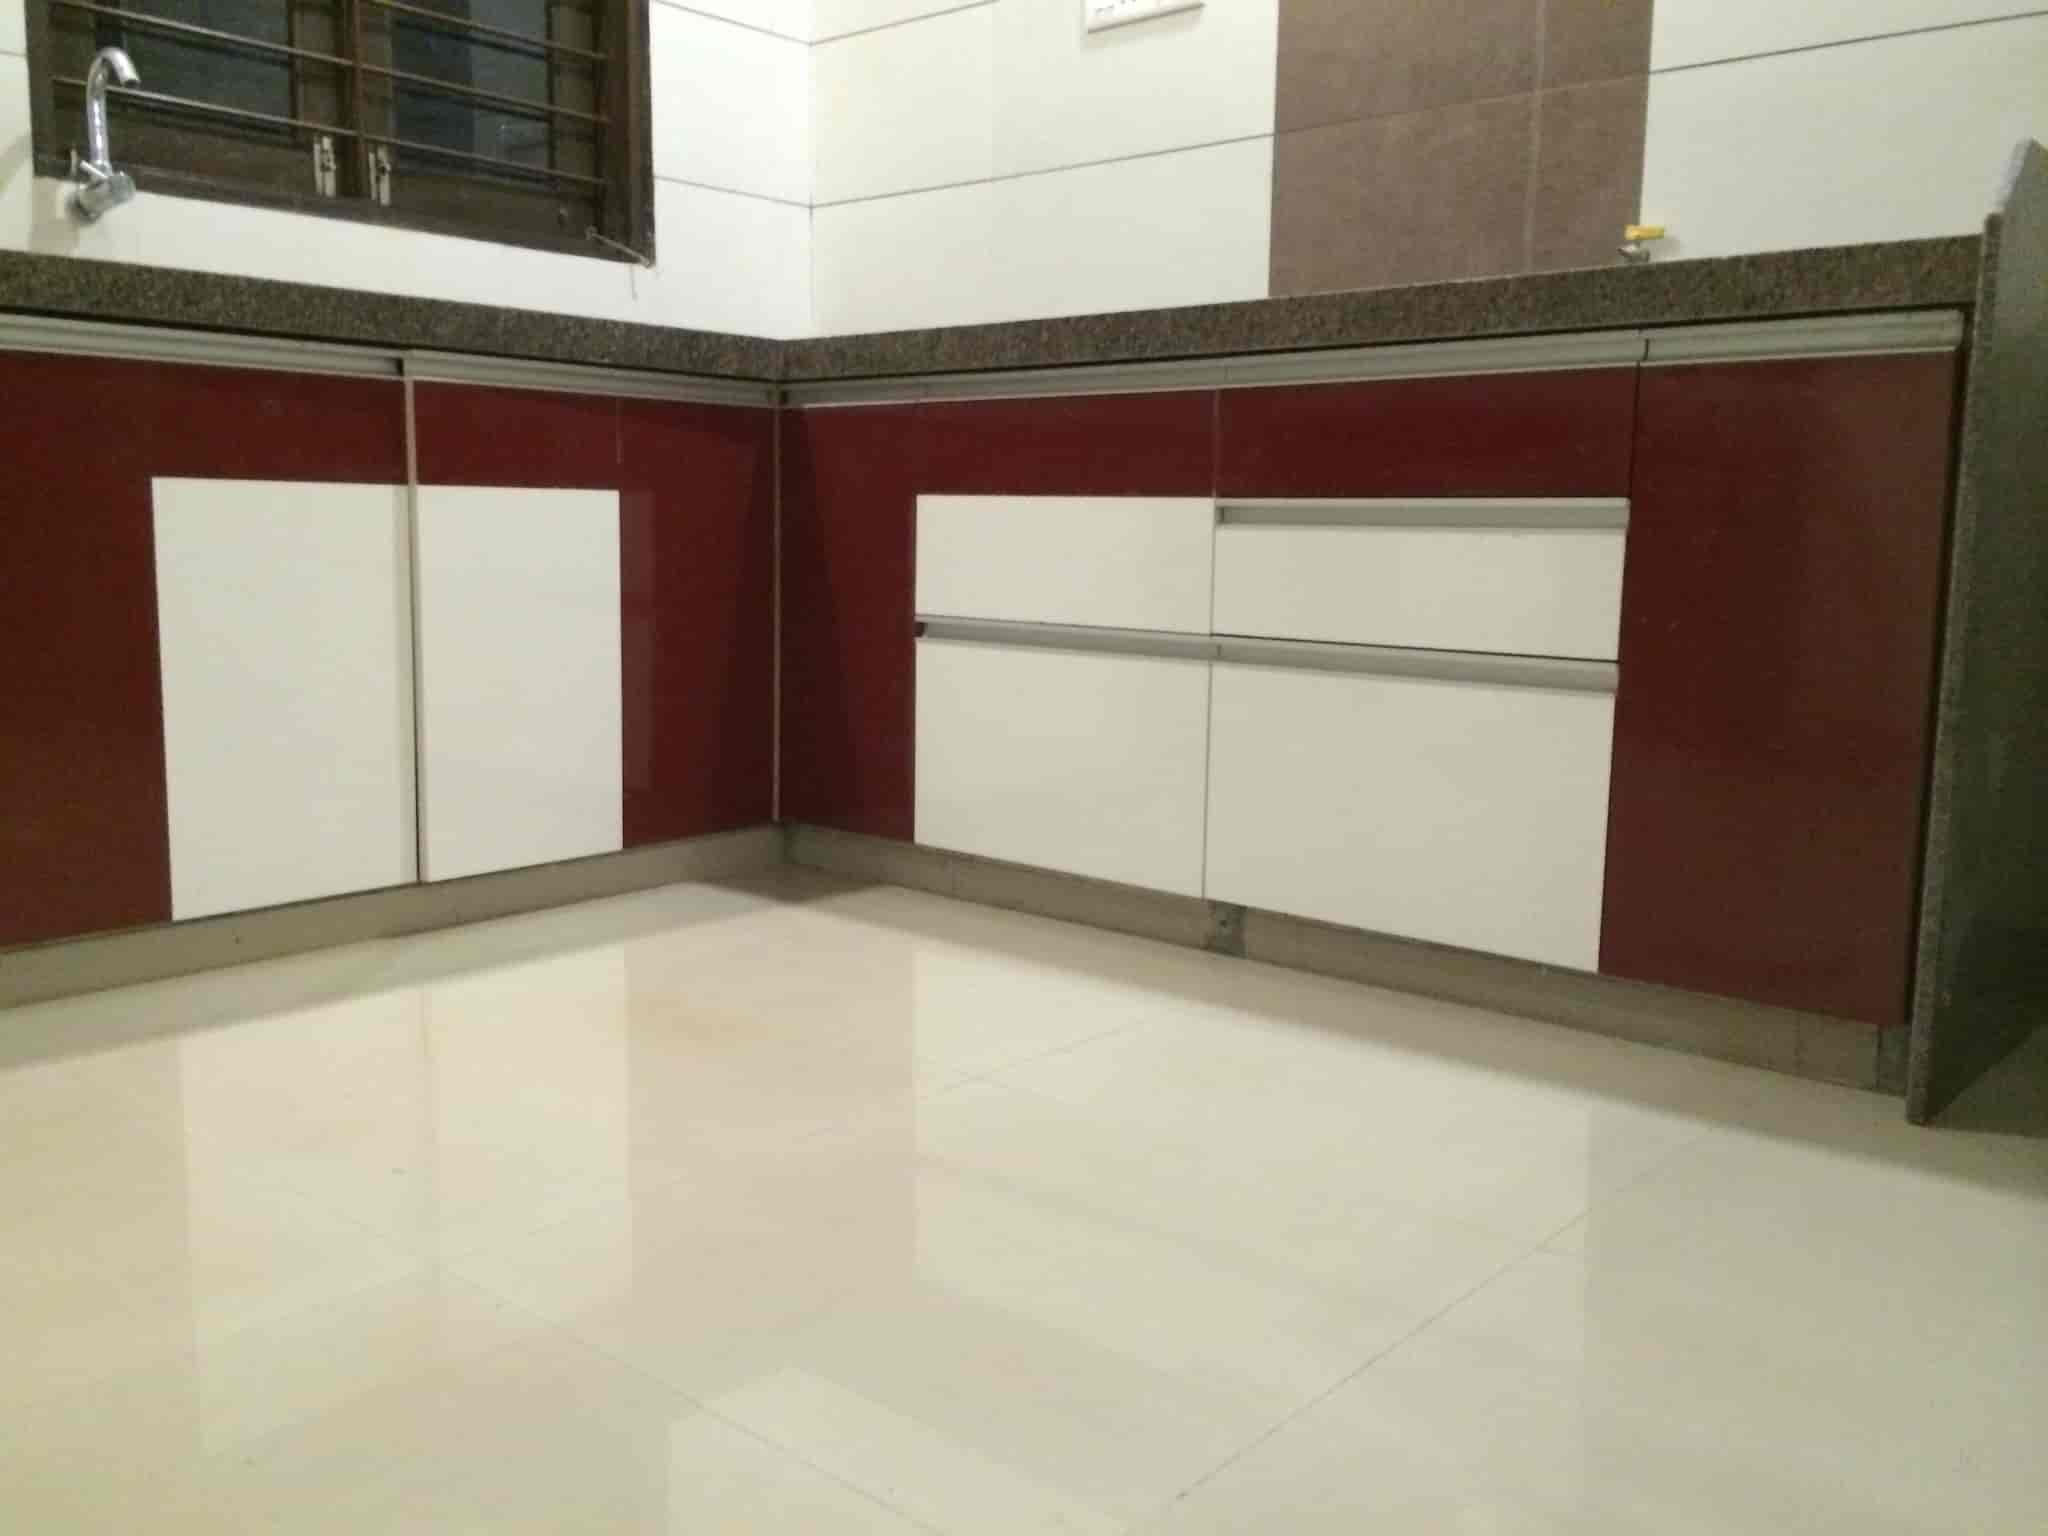 Ultra Kitchen Cabinets Pvt Ltd, Akshar Chowk - Kitchen Cabinet ...